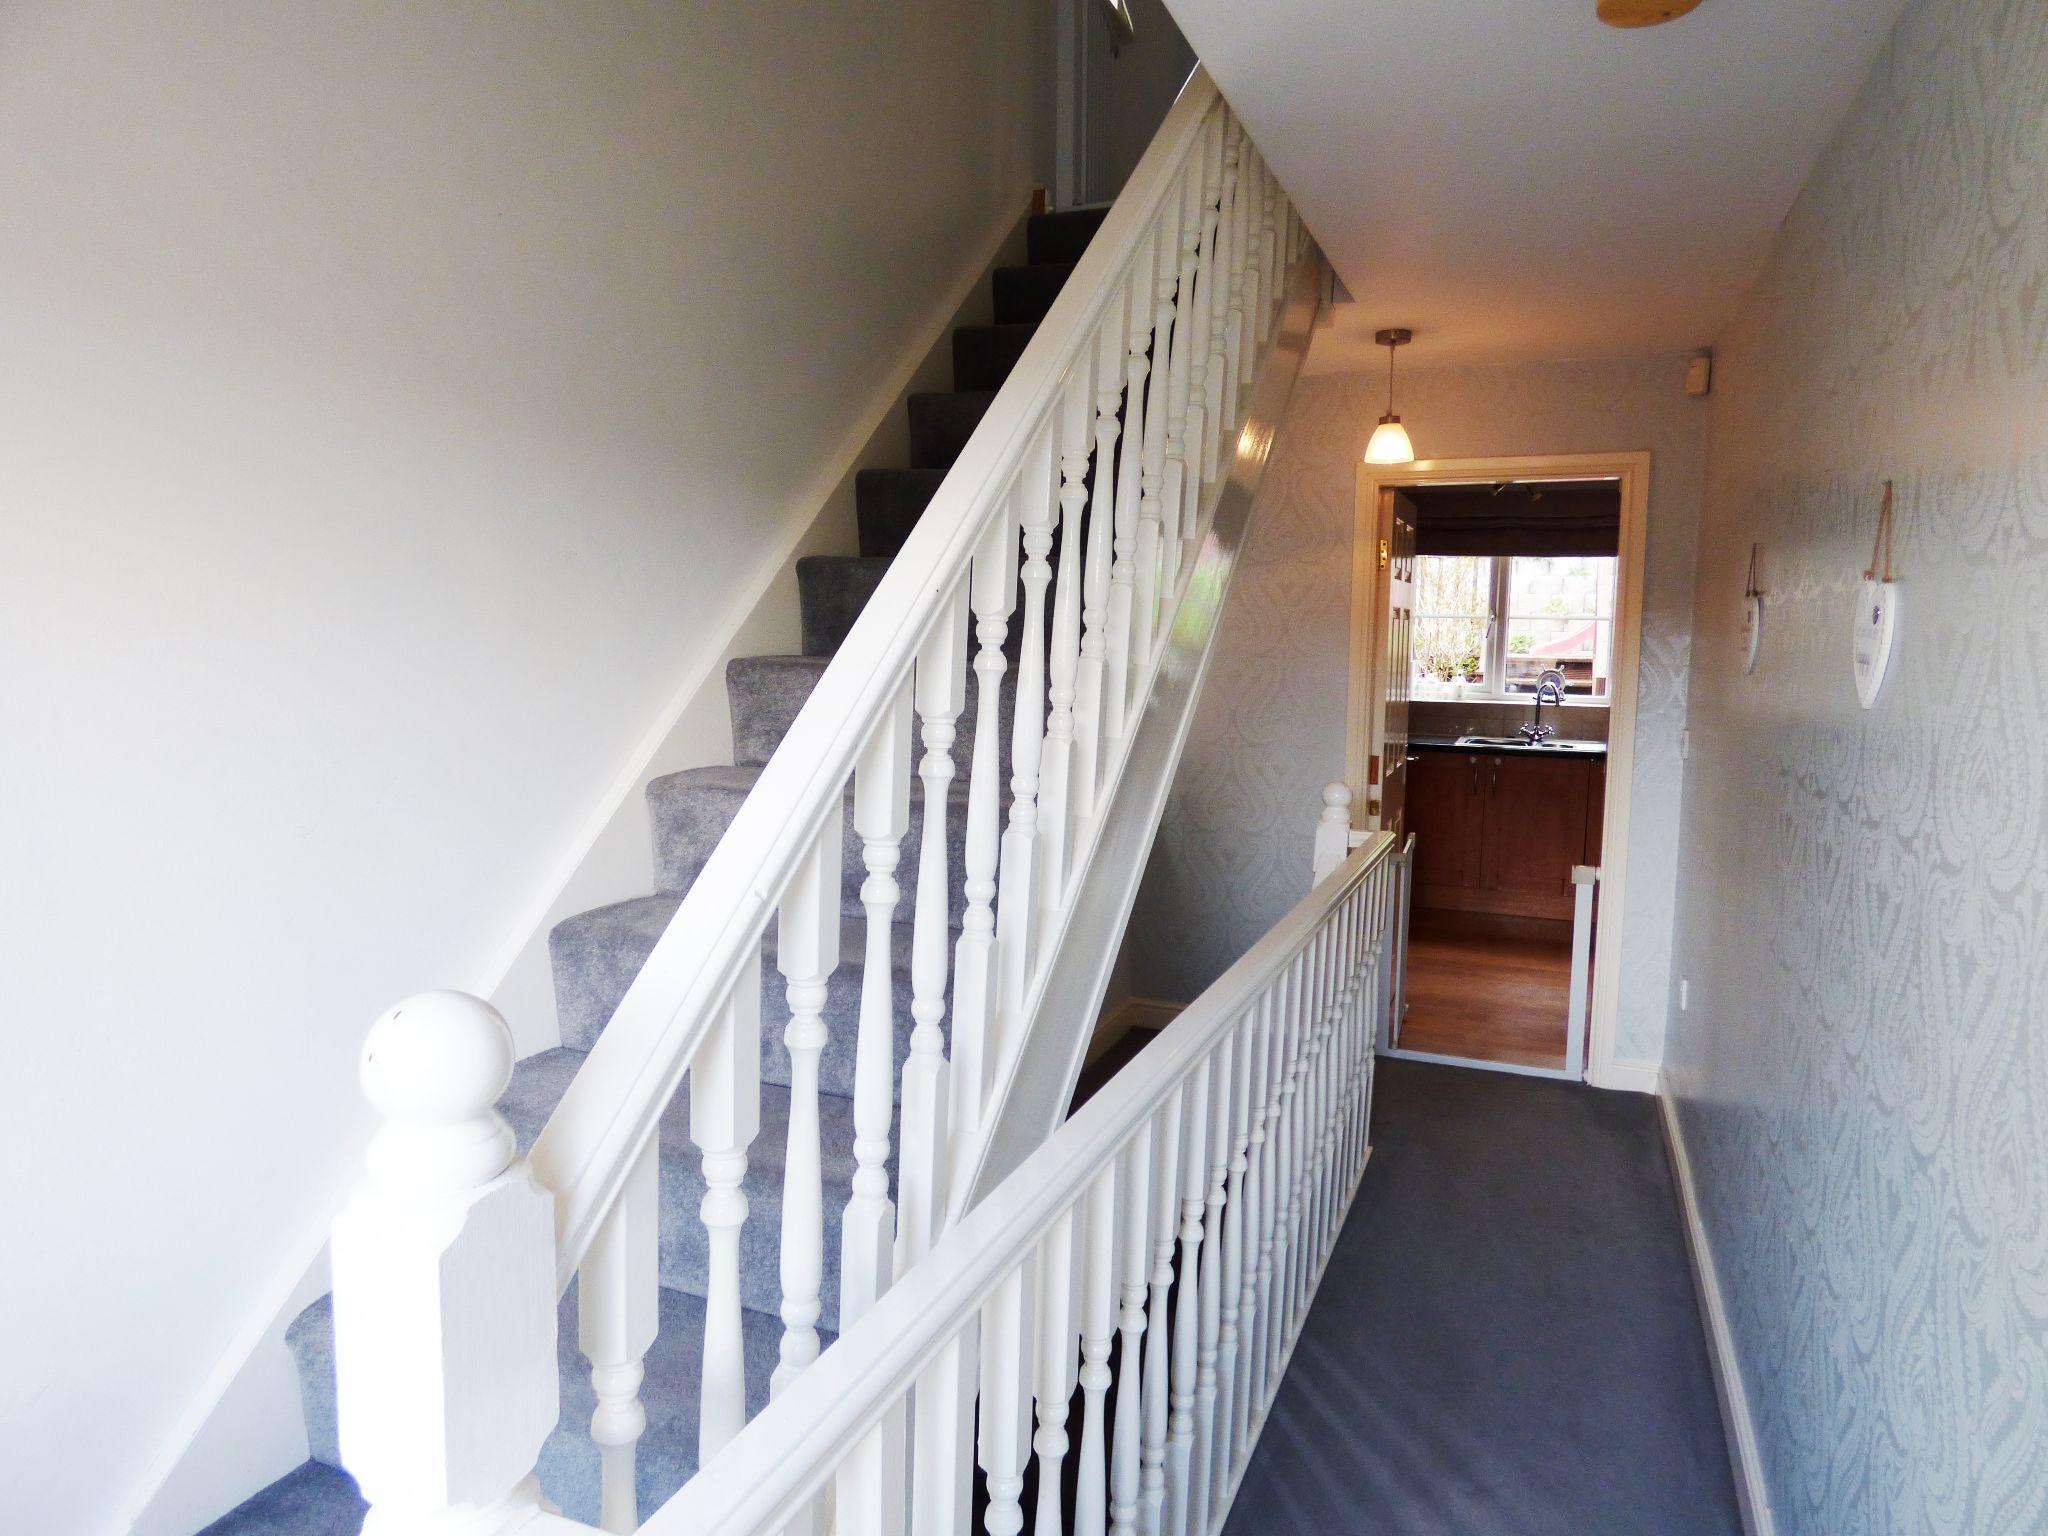 4 Bedroom Semi-detached House For Sale - Landing